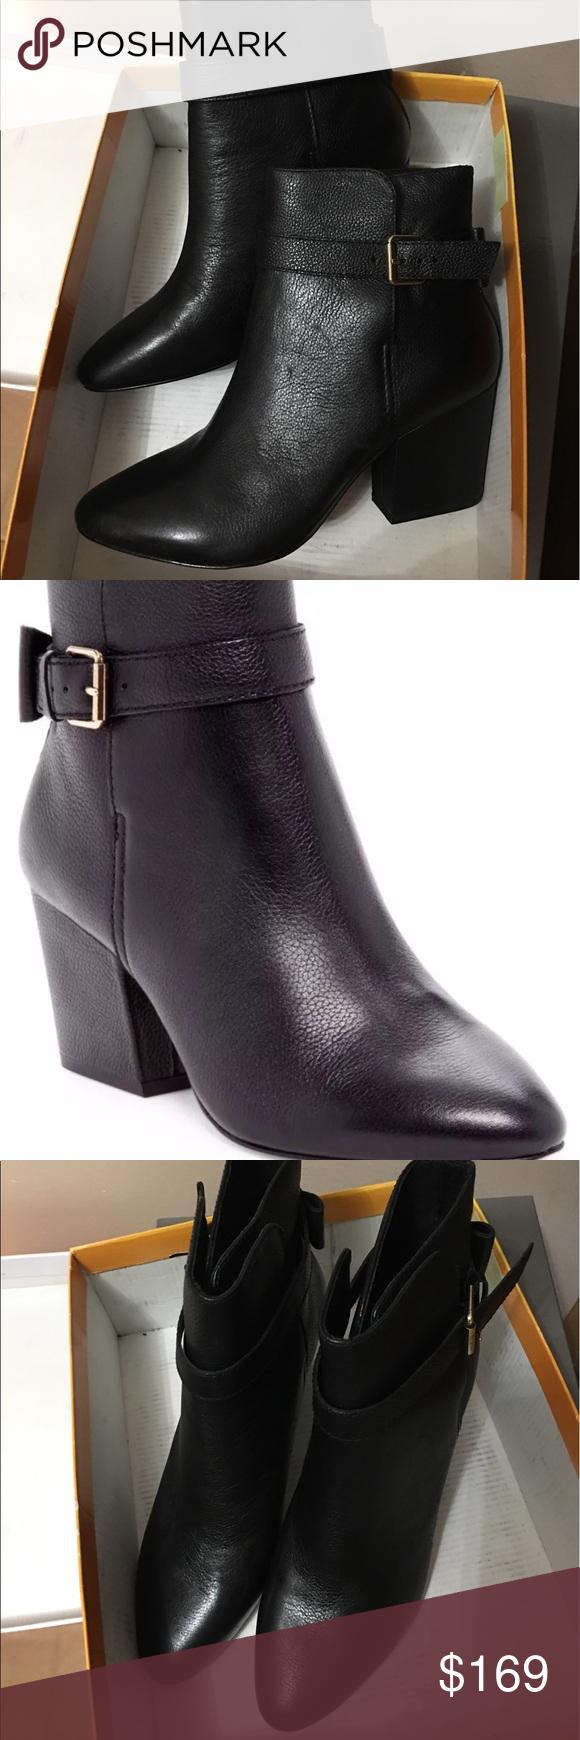 c6e779a8cfca Kate Spade Brandi booties size 9 black Kate Spade New York Brandi Bootie  Black pebbled leather